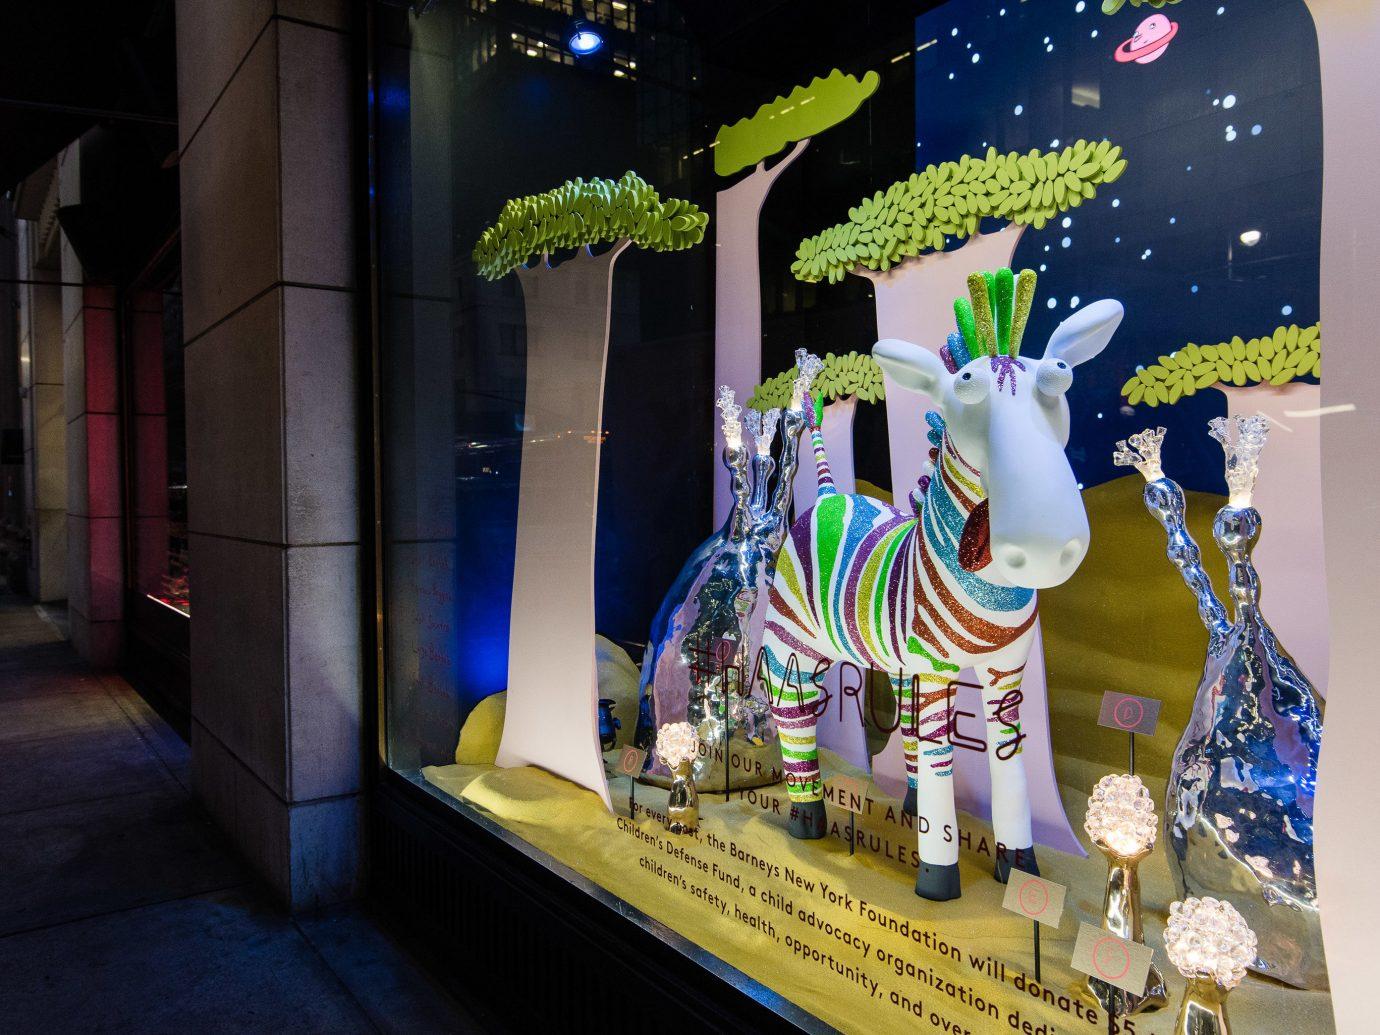 Offbeat Winter display window art tourist attraction